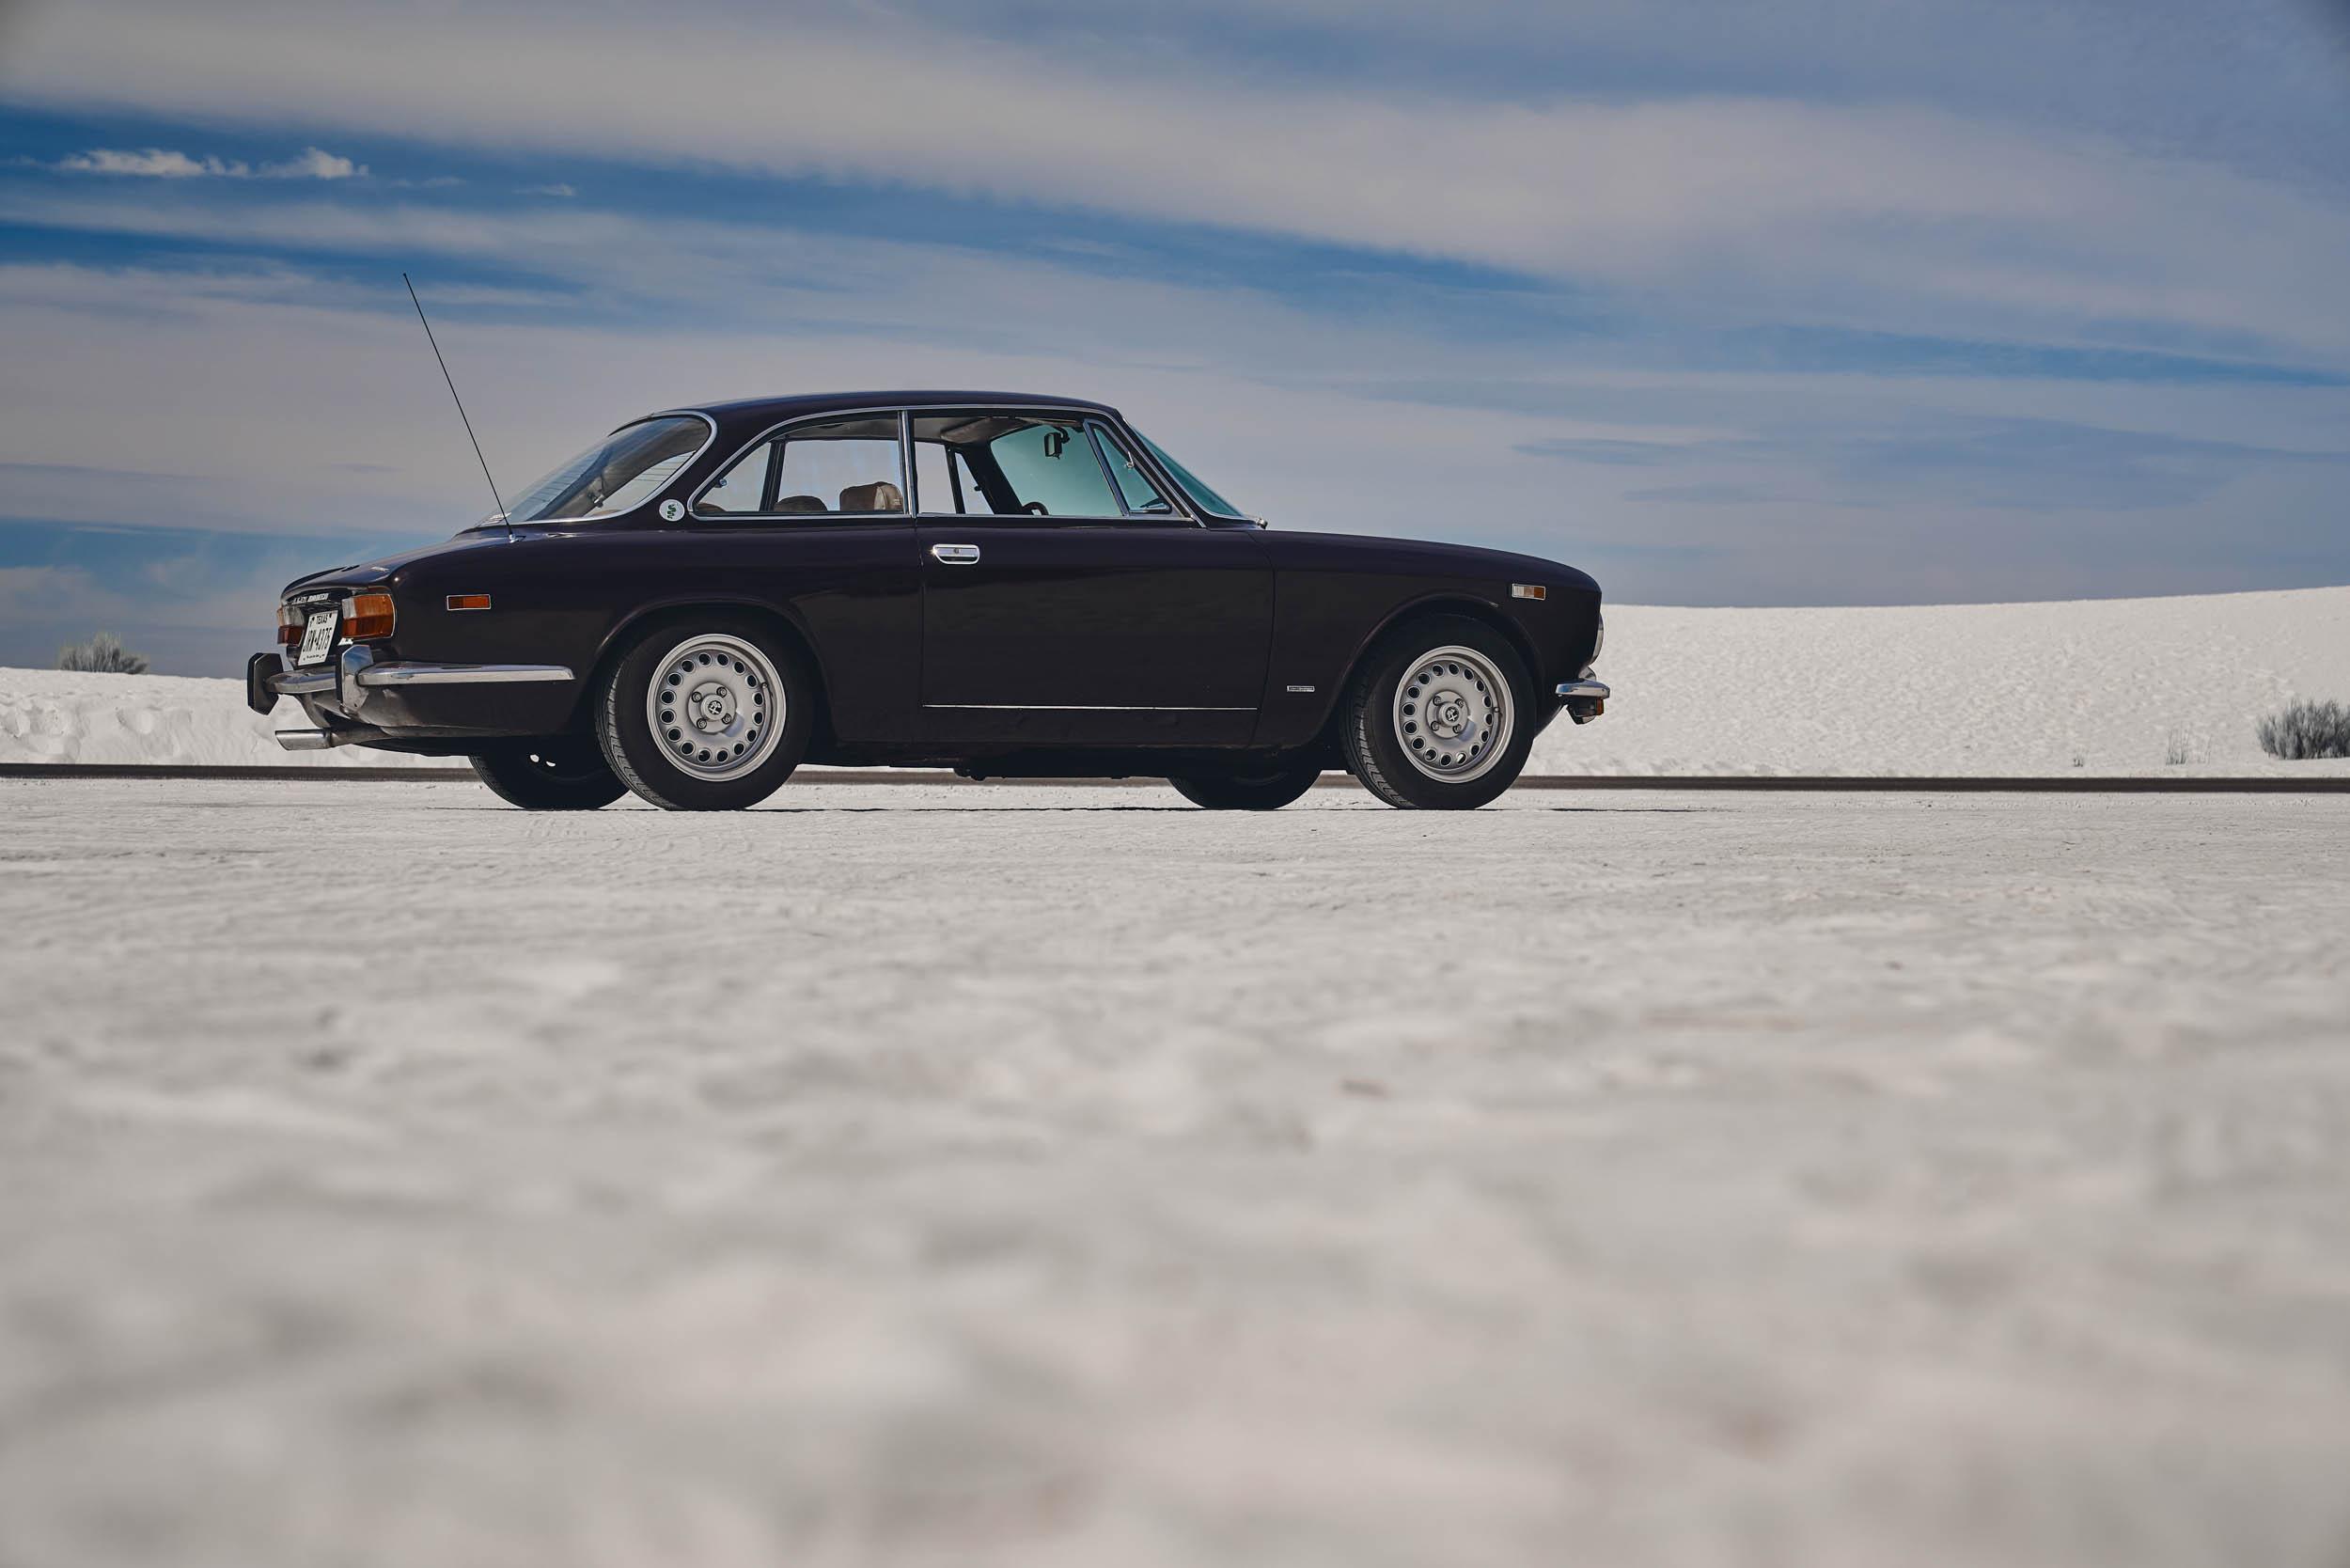 Alfa Romeo GTV desert profile